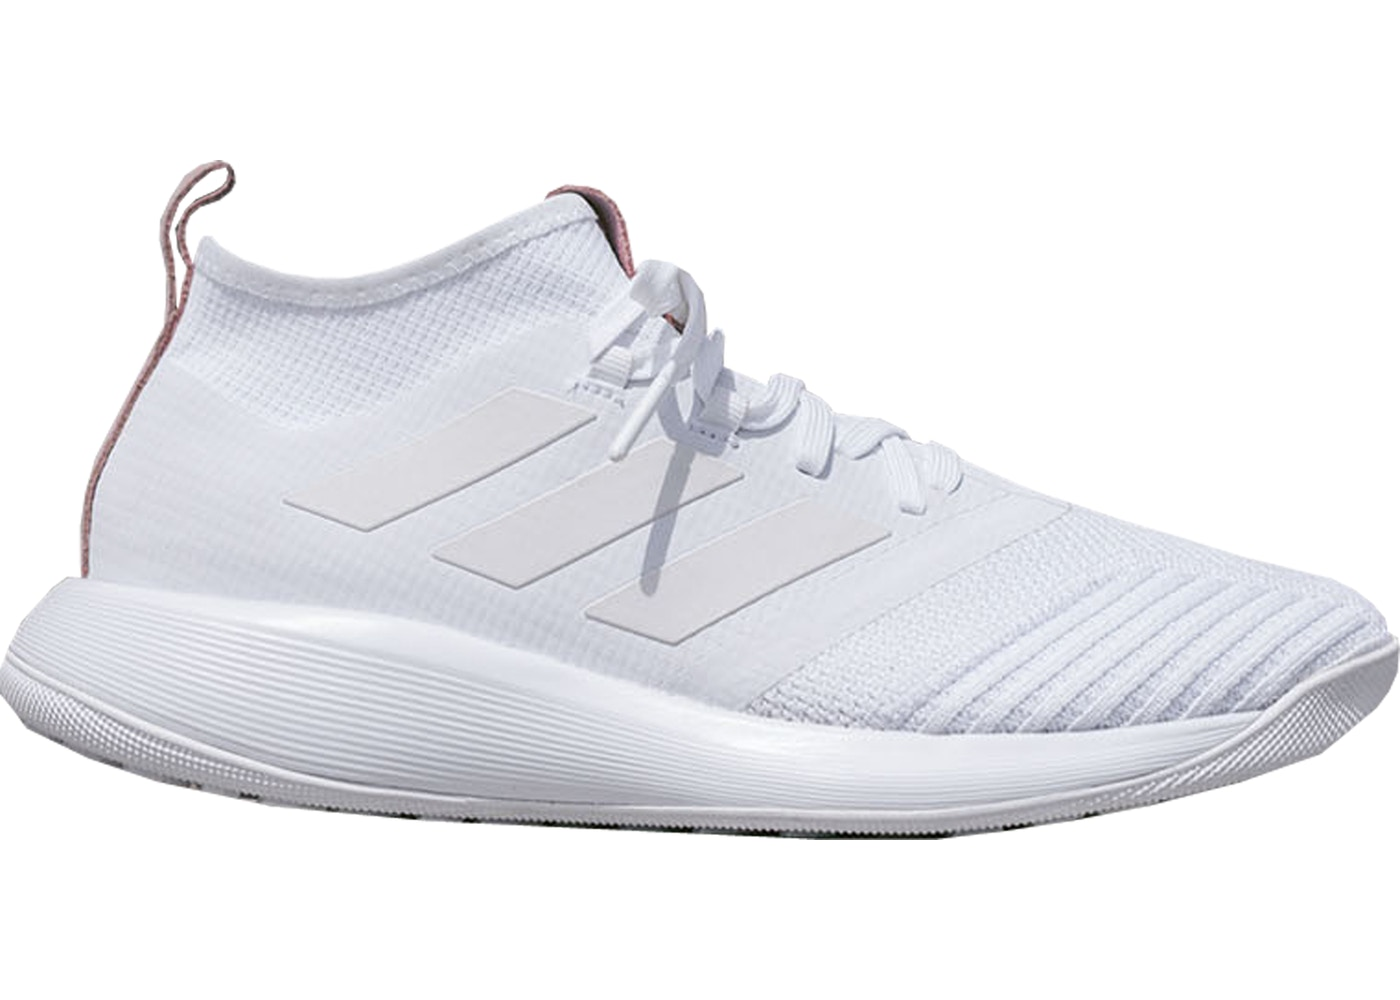 3b4ff9d03 adidas ACE Tango 17.1 PureControl Turf Trainer Kith Flamingos - CM7893